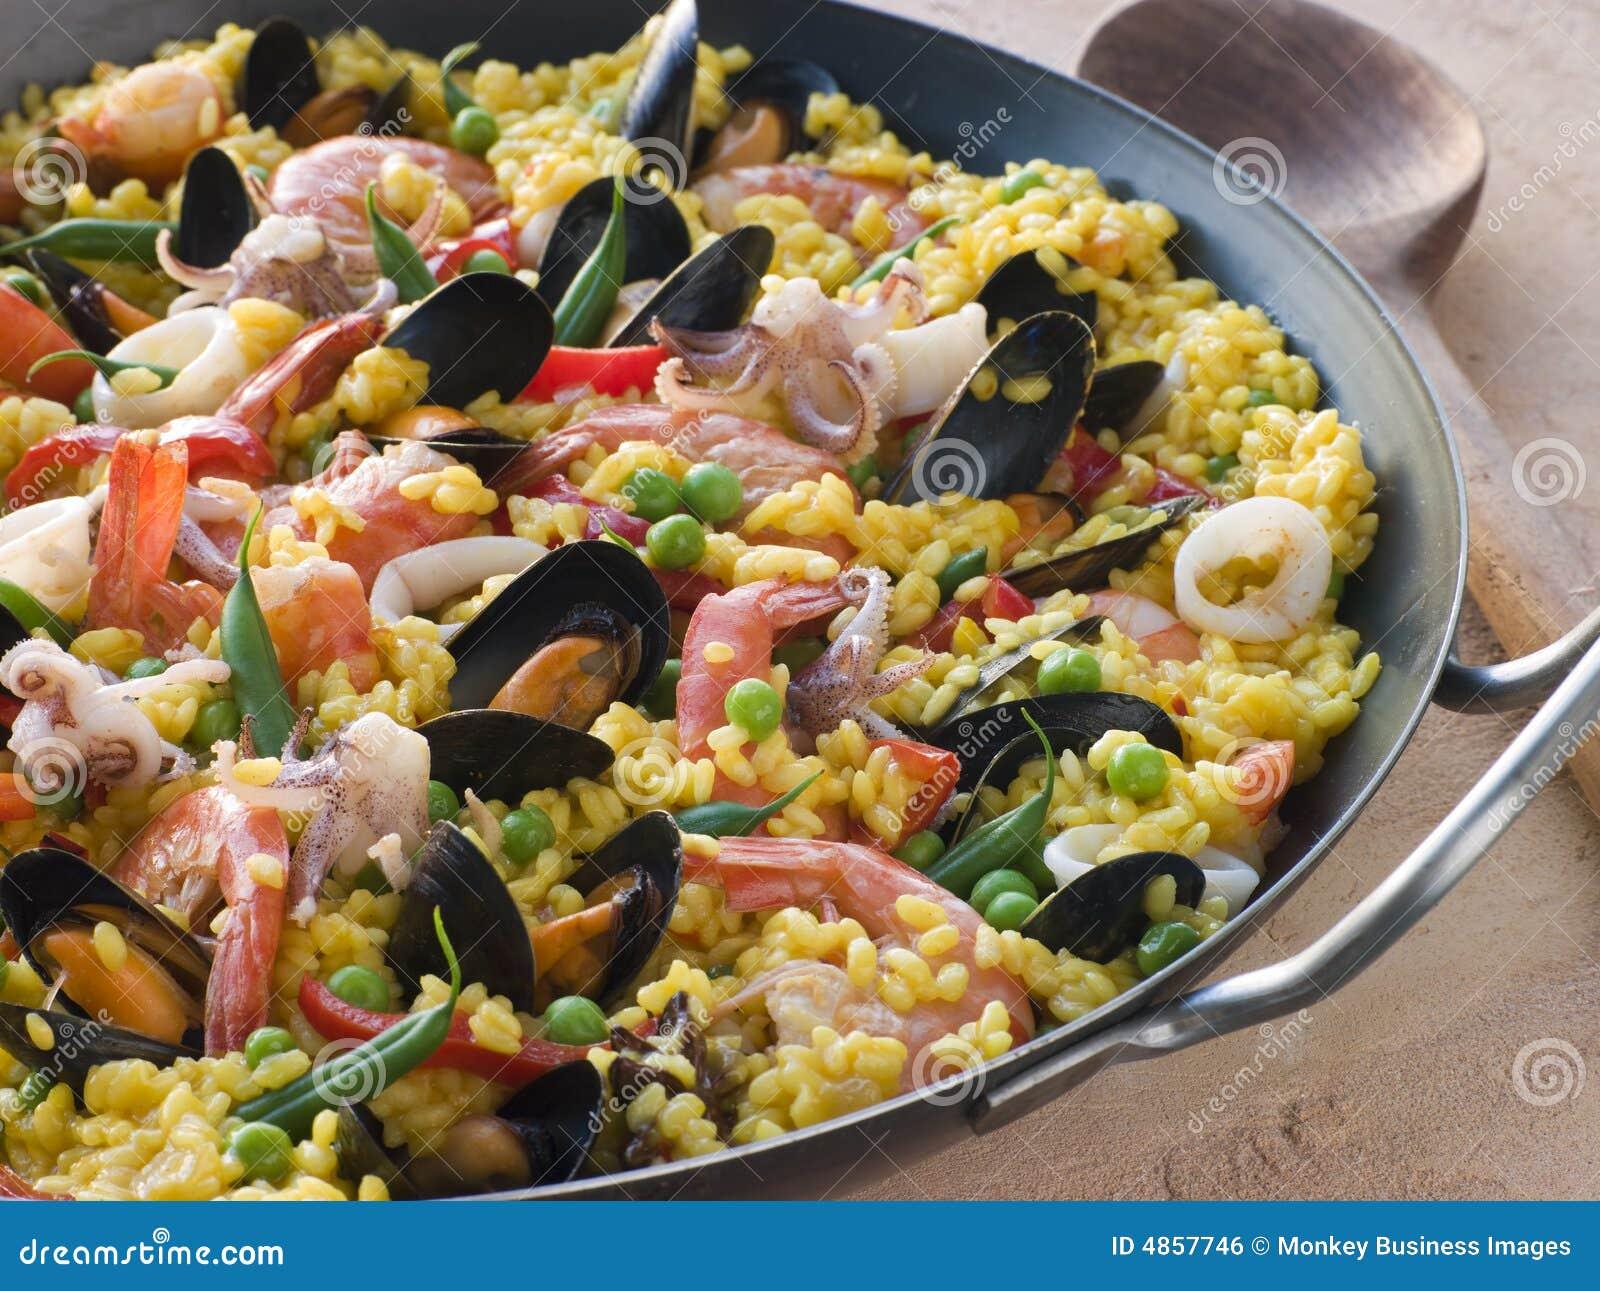 Seafood Paella in a Pan